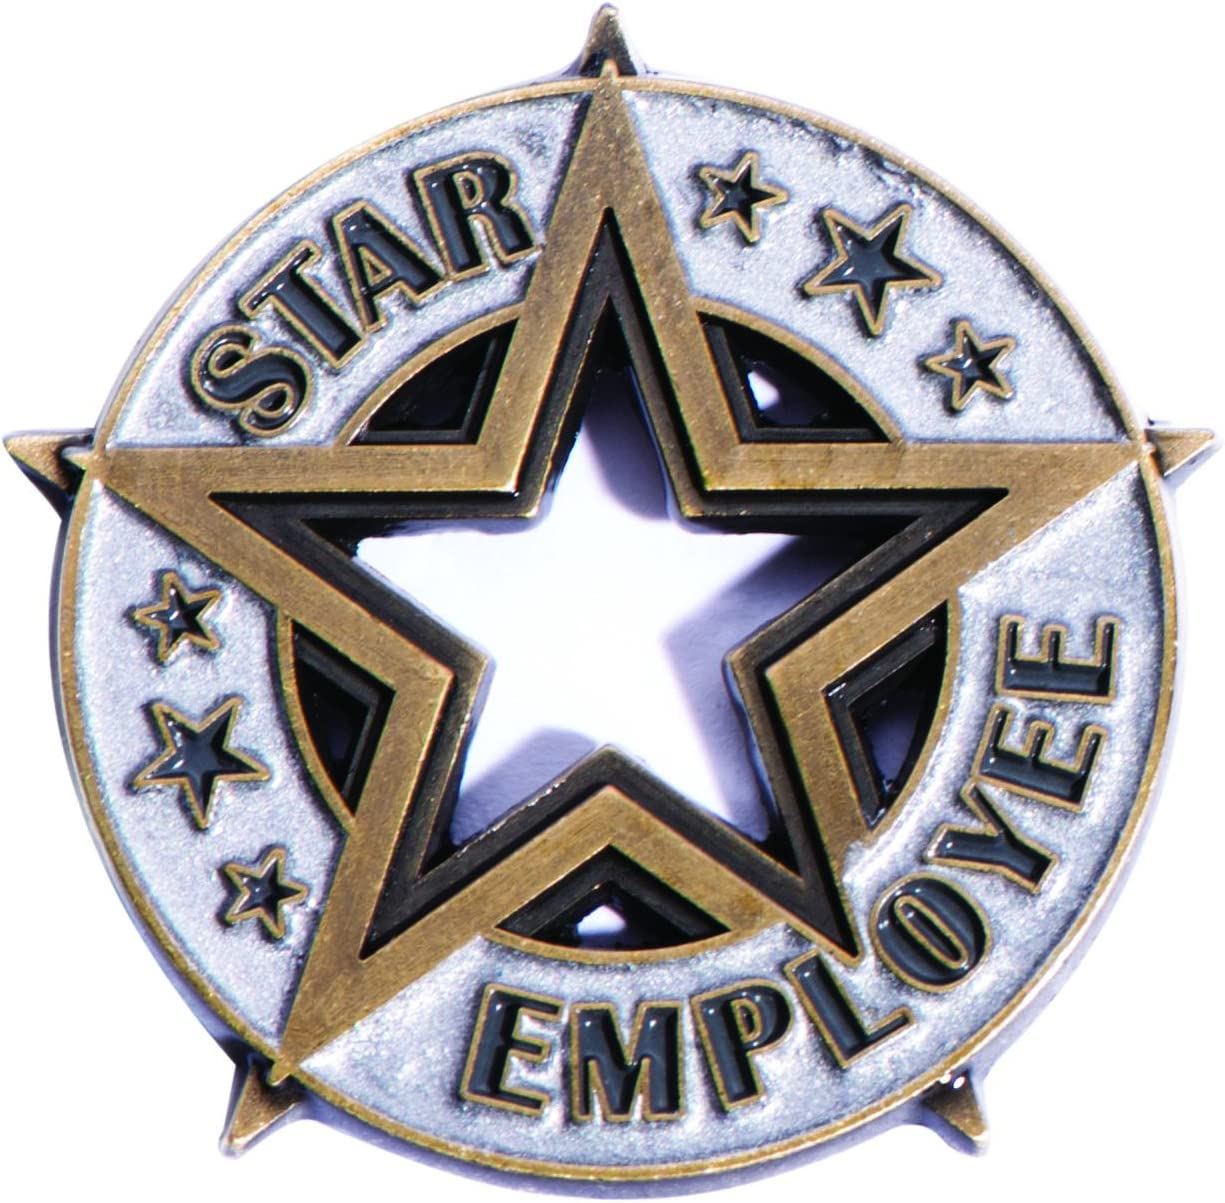 TCDesignerProducts Star Employee Appreciation Award Lapel Pin